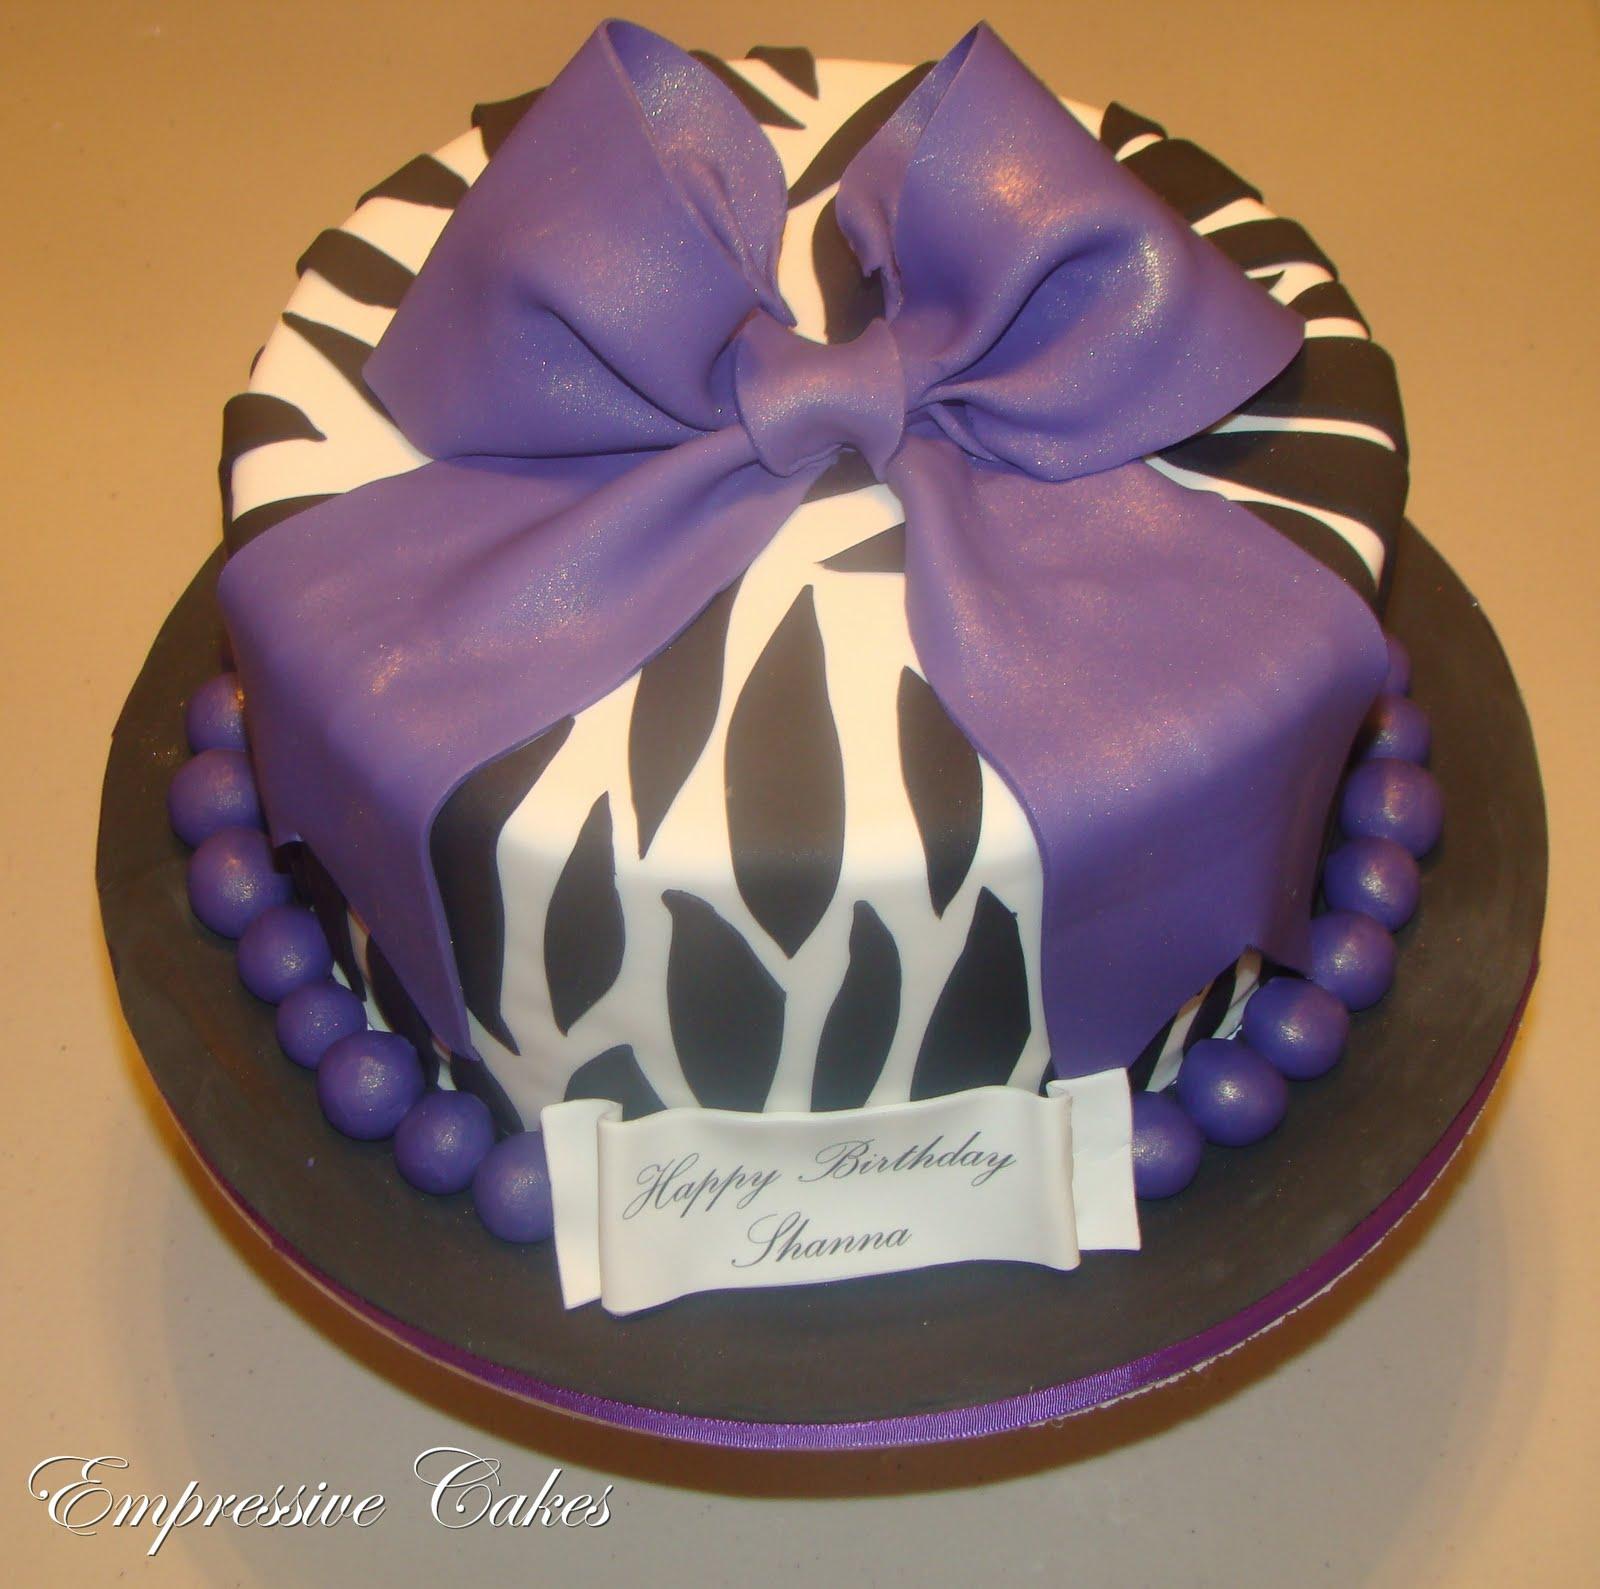 Empressive Cakes: Zebra Print Cake With Purple Bow